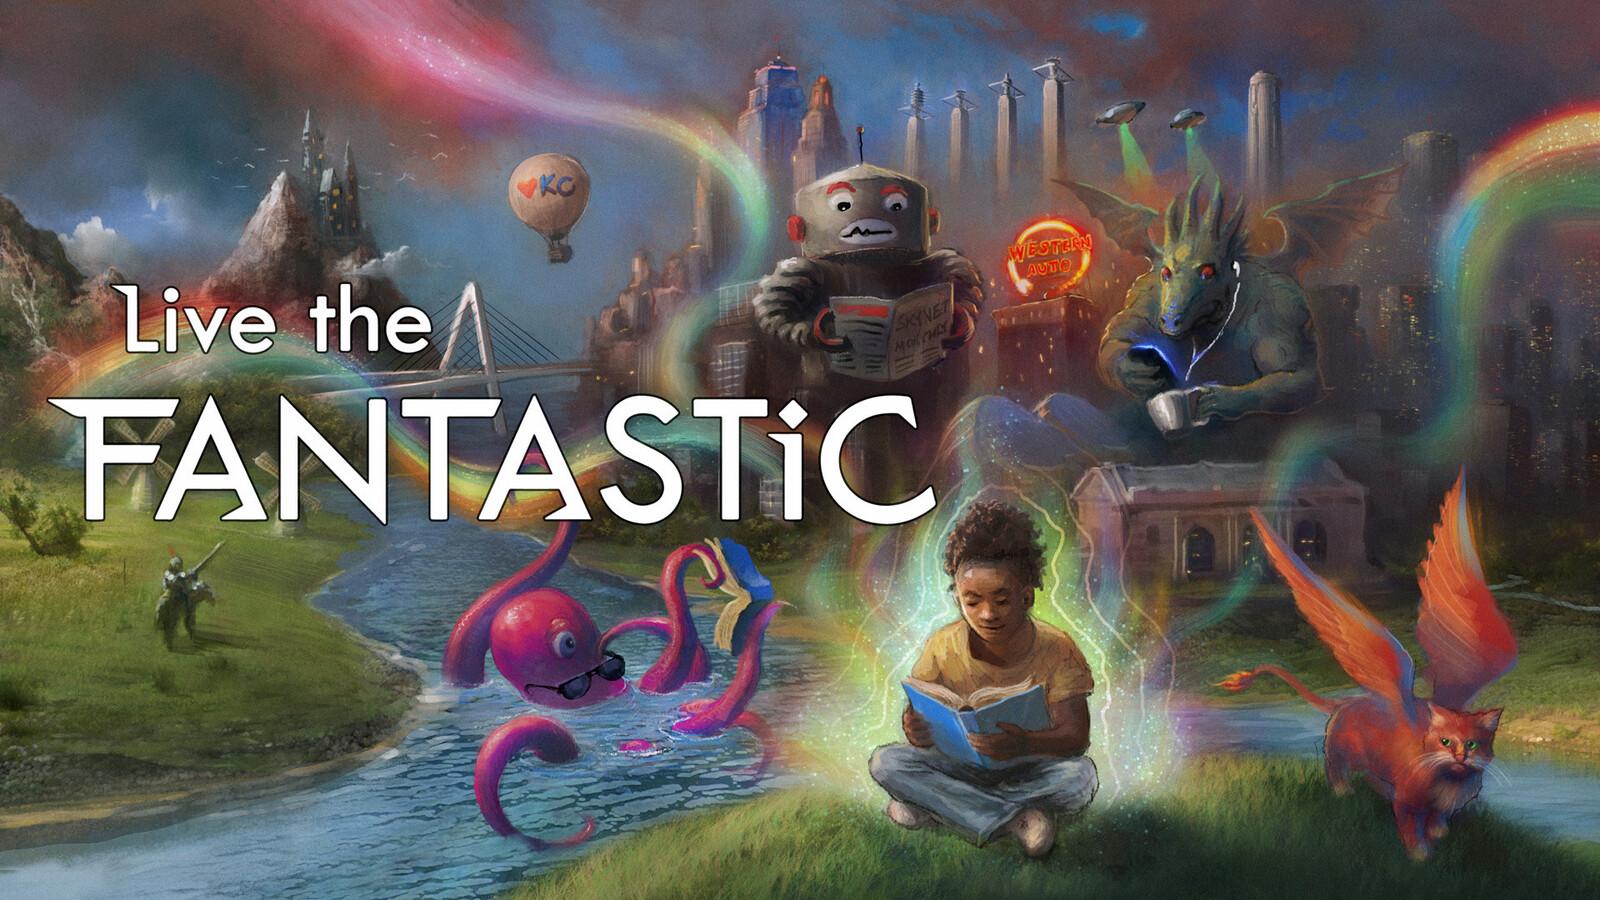 Live the Fantastic - Summer Reading Program 2020